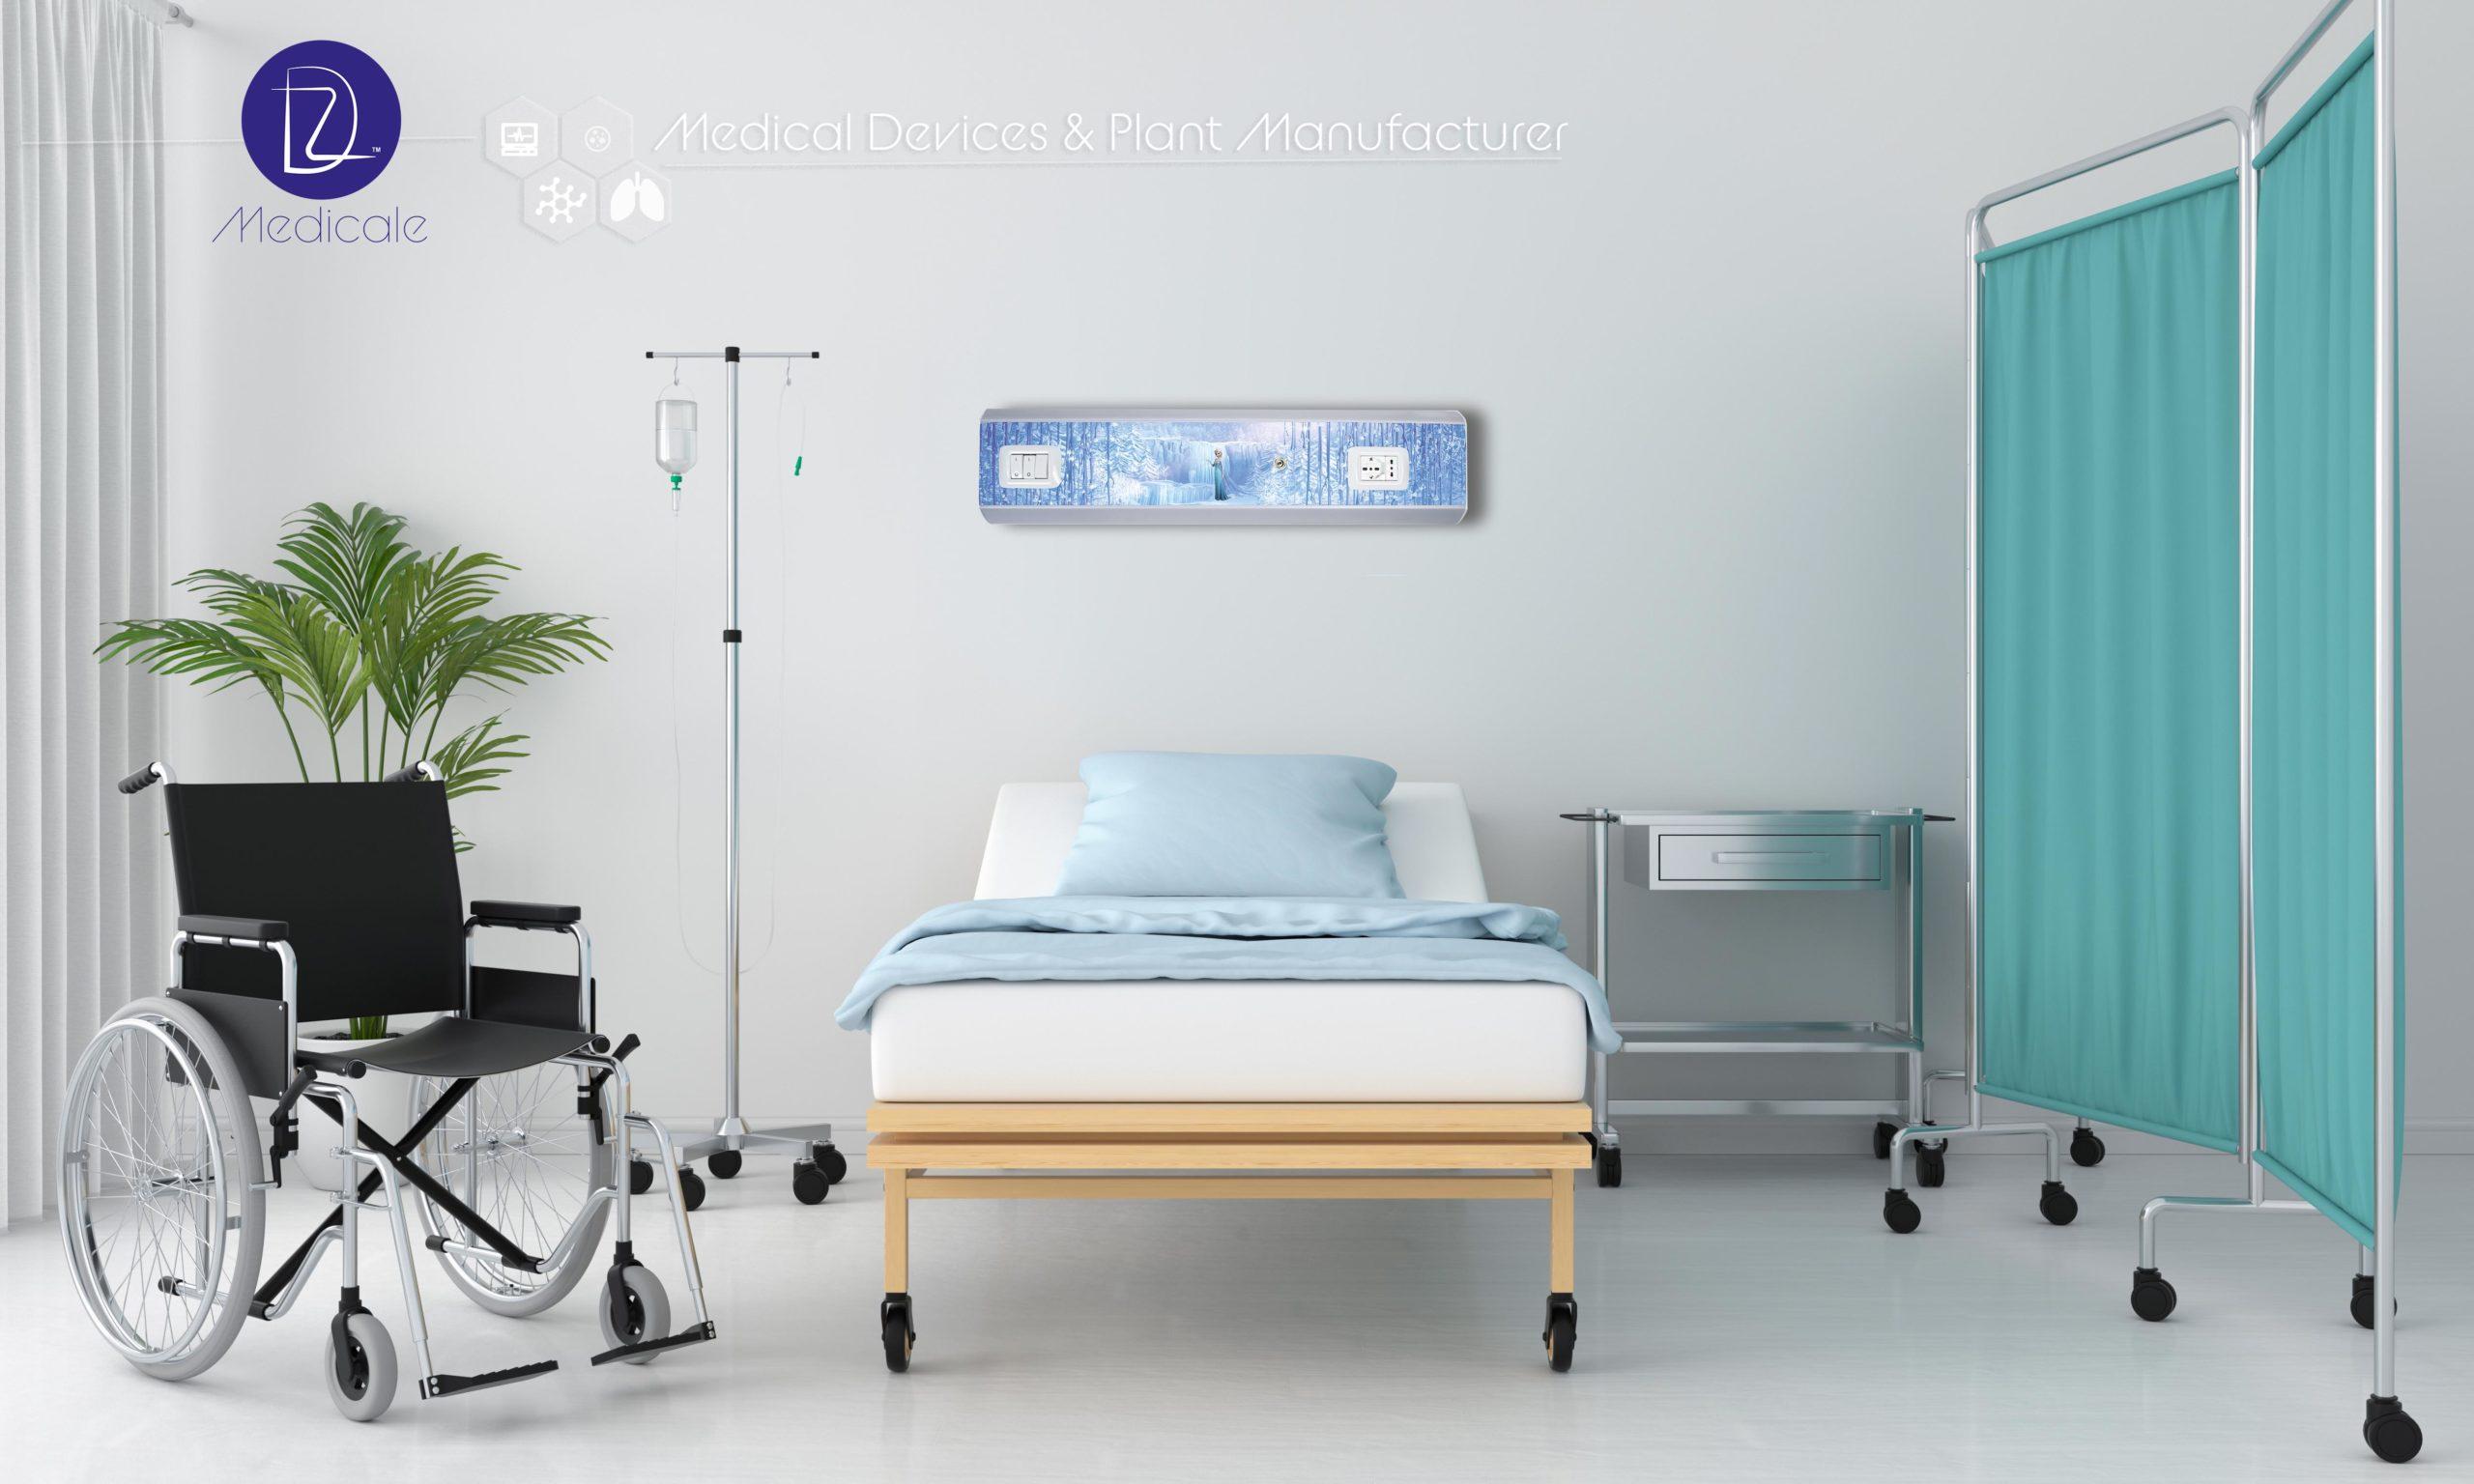 DZ Medicale - BHU Viola custom 3